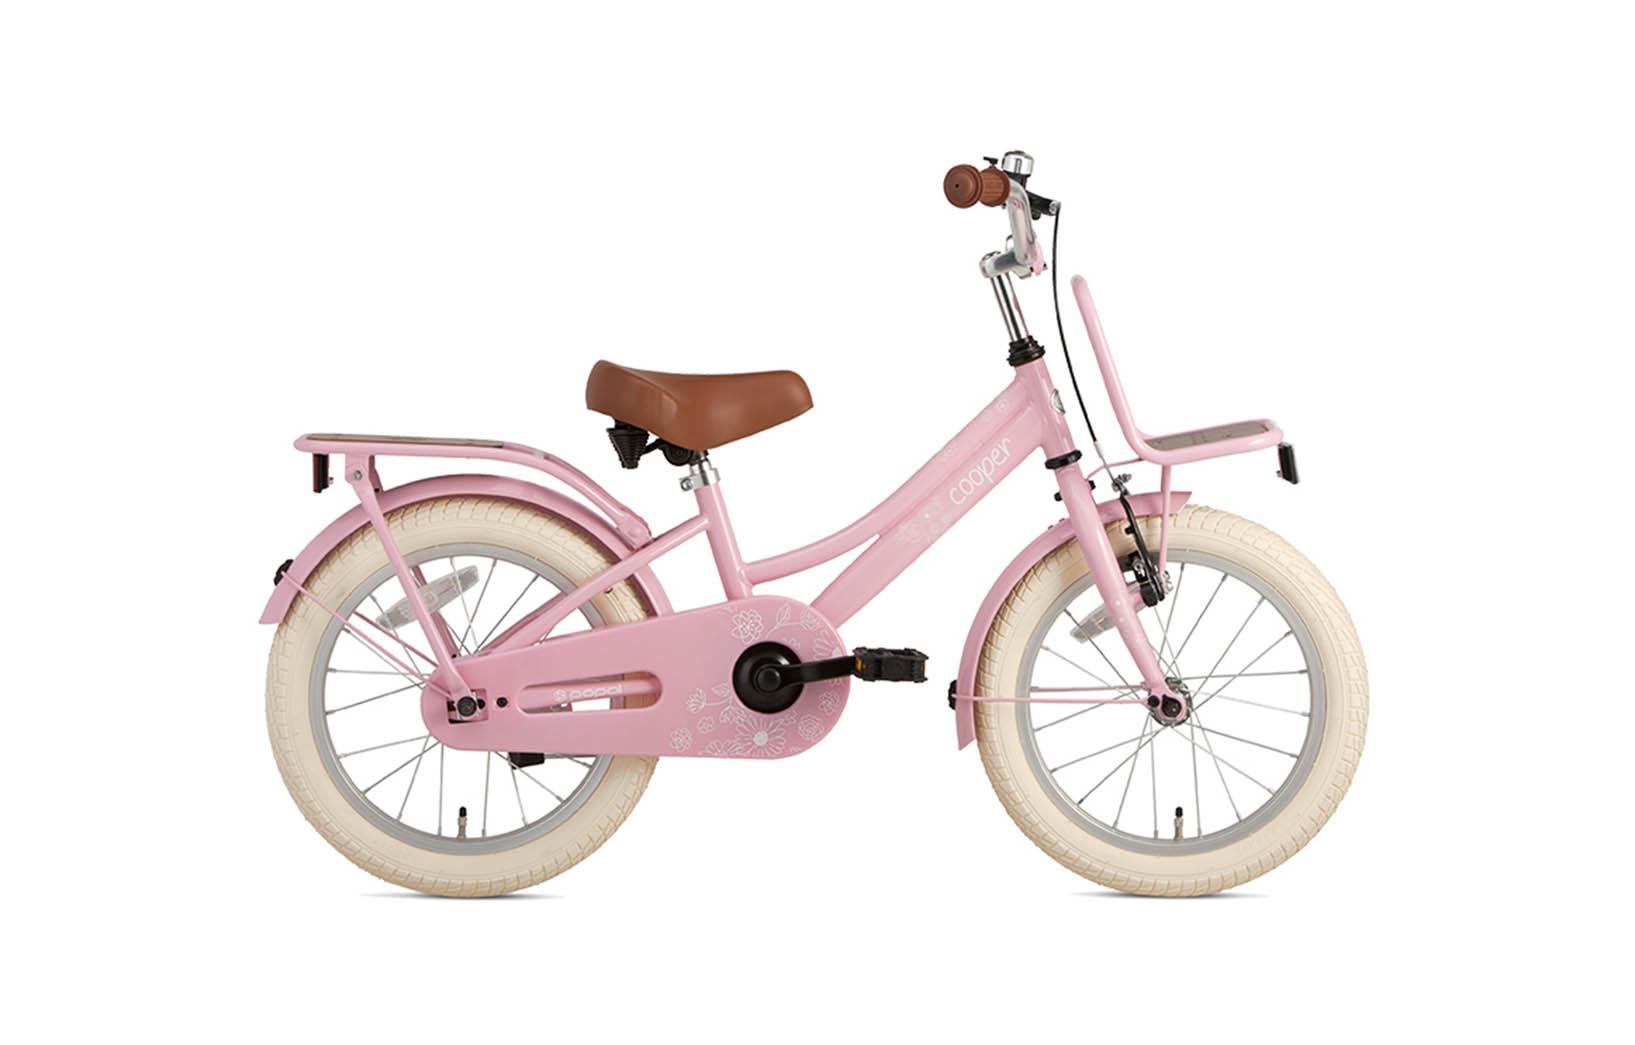 Bicicleta para ninos hoofdbeeld